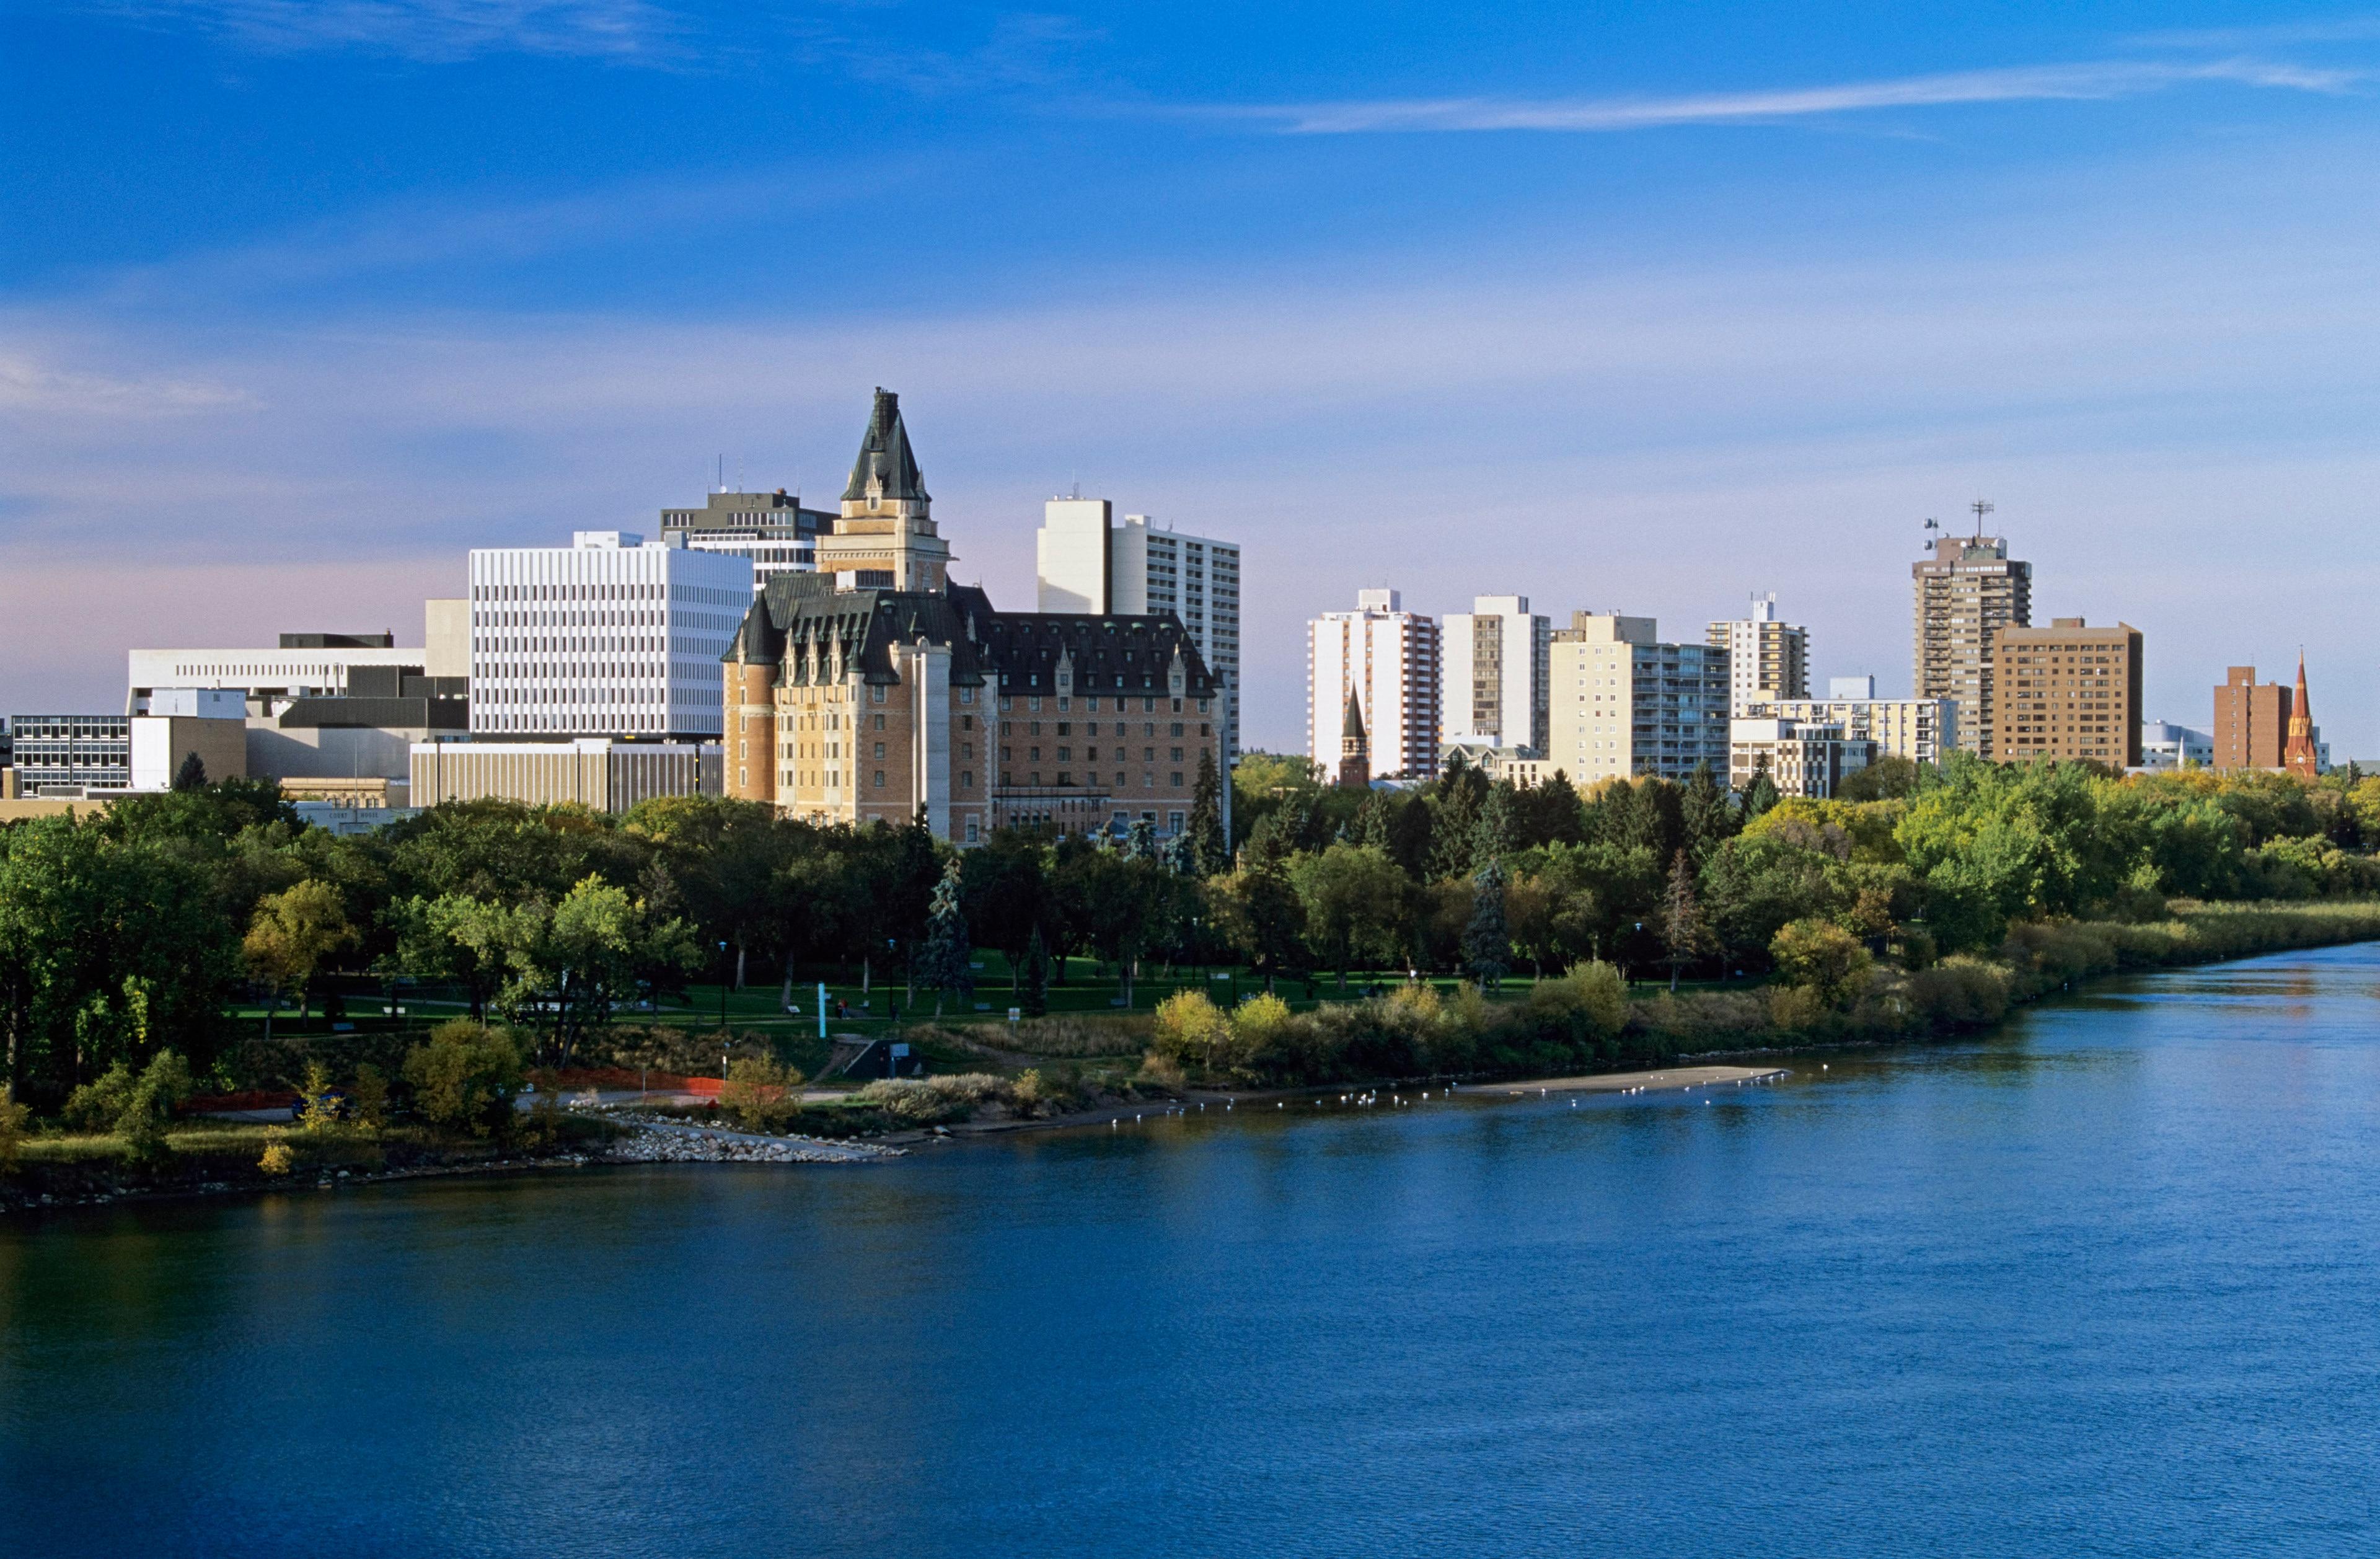 Saskatoon, Saskatchewan, Canada